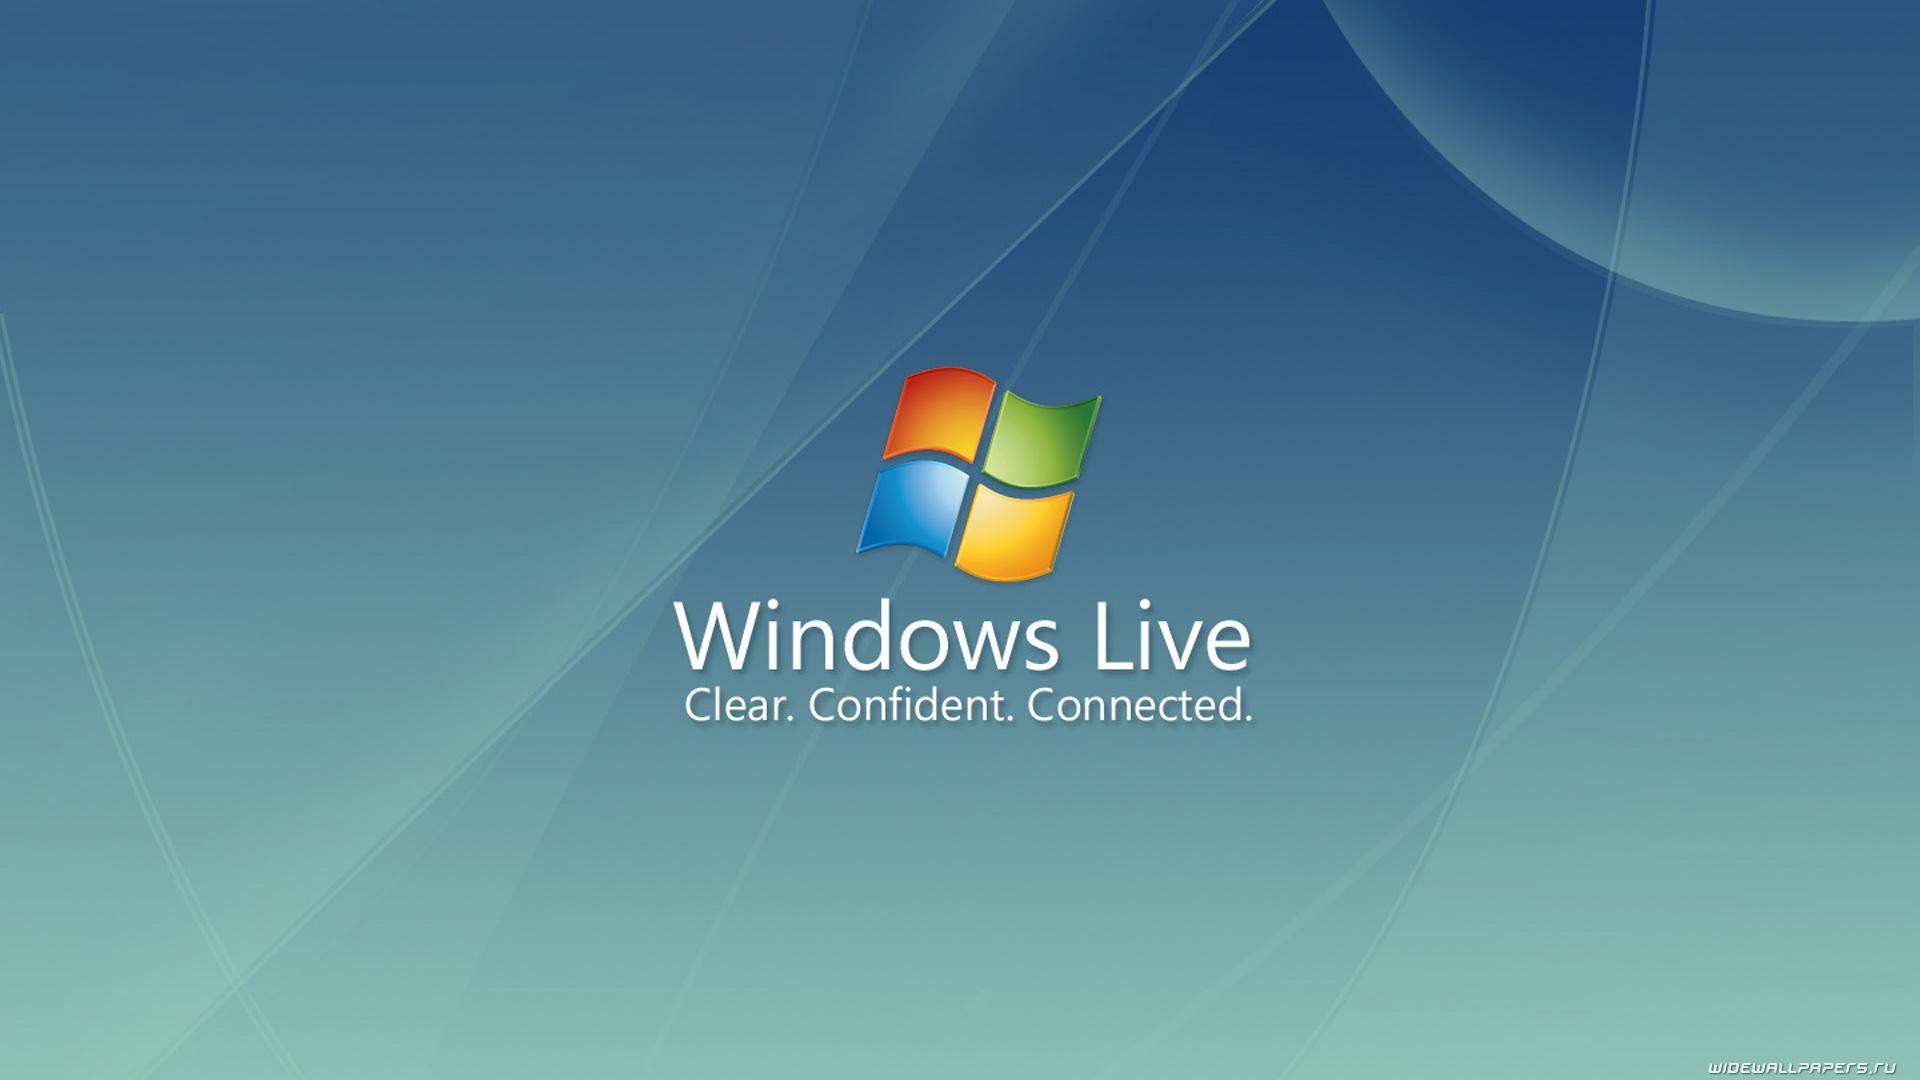 Hd wallpaper live - Windows Live Wallpapers Hd Wallpapers